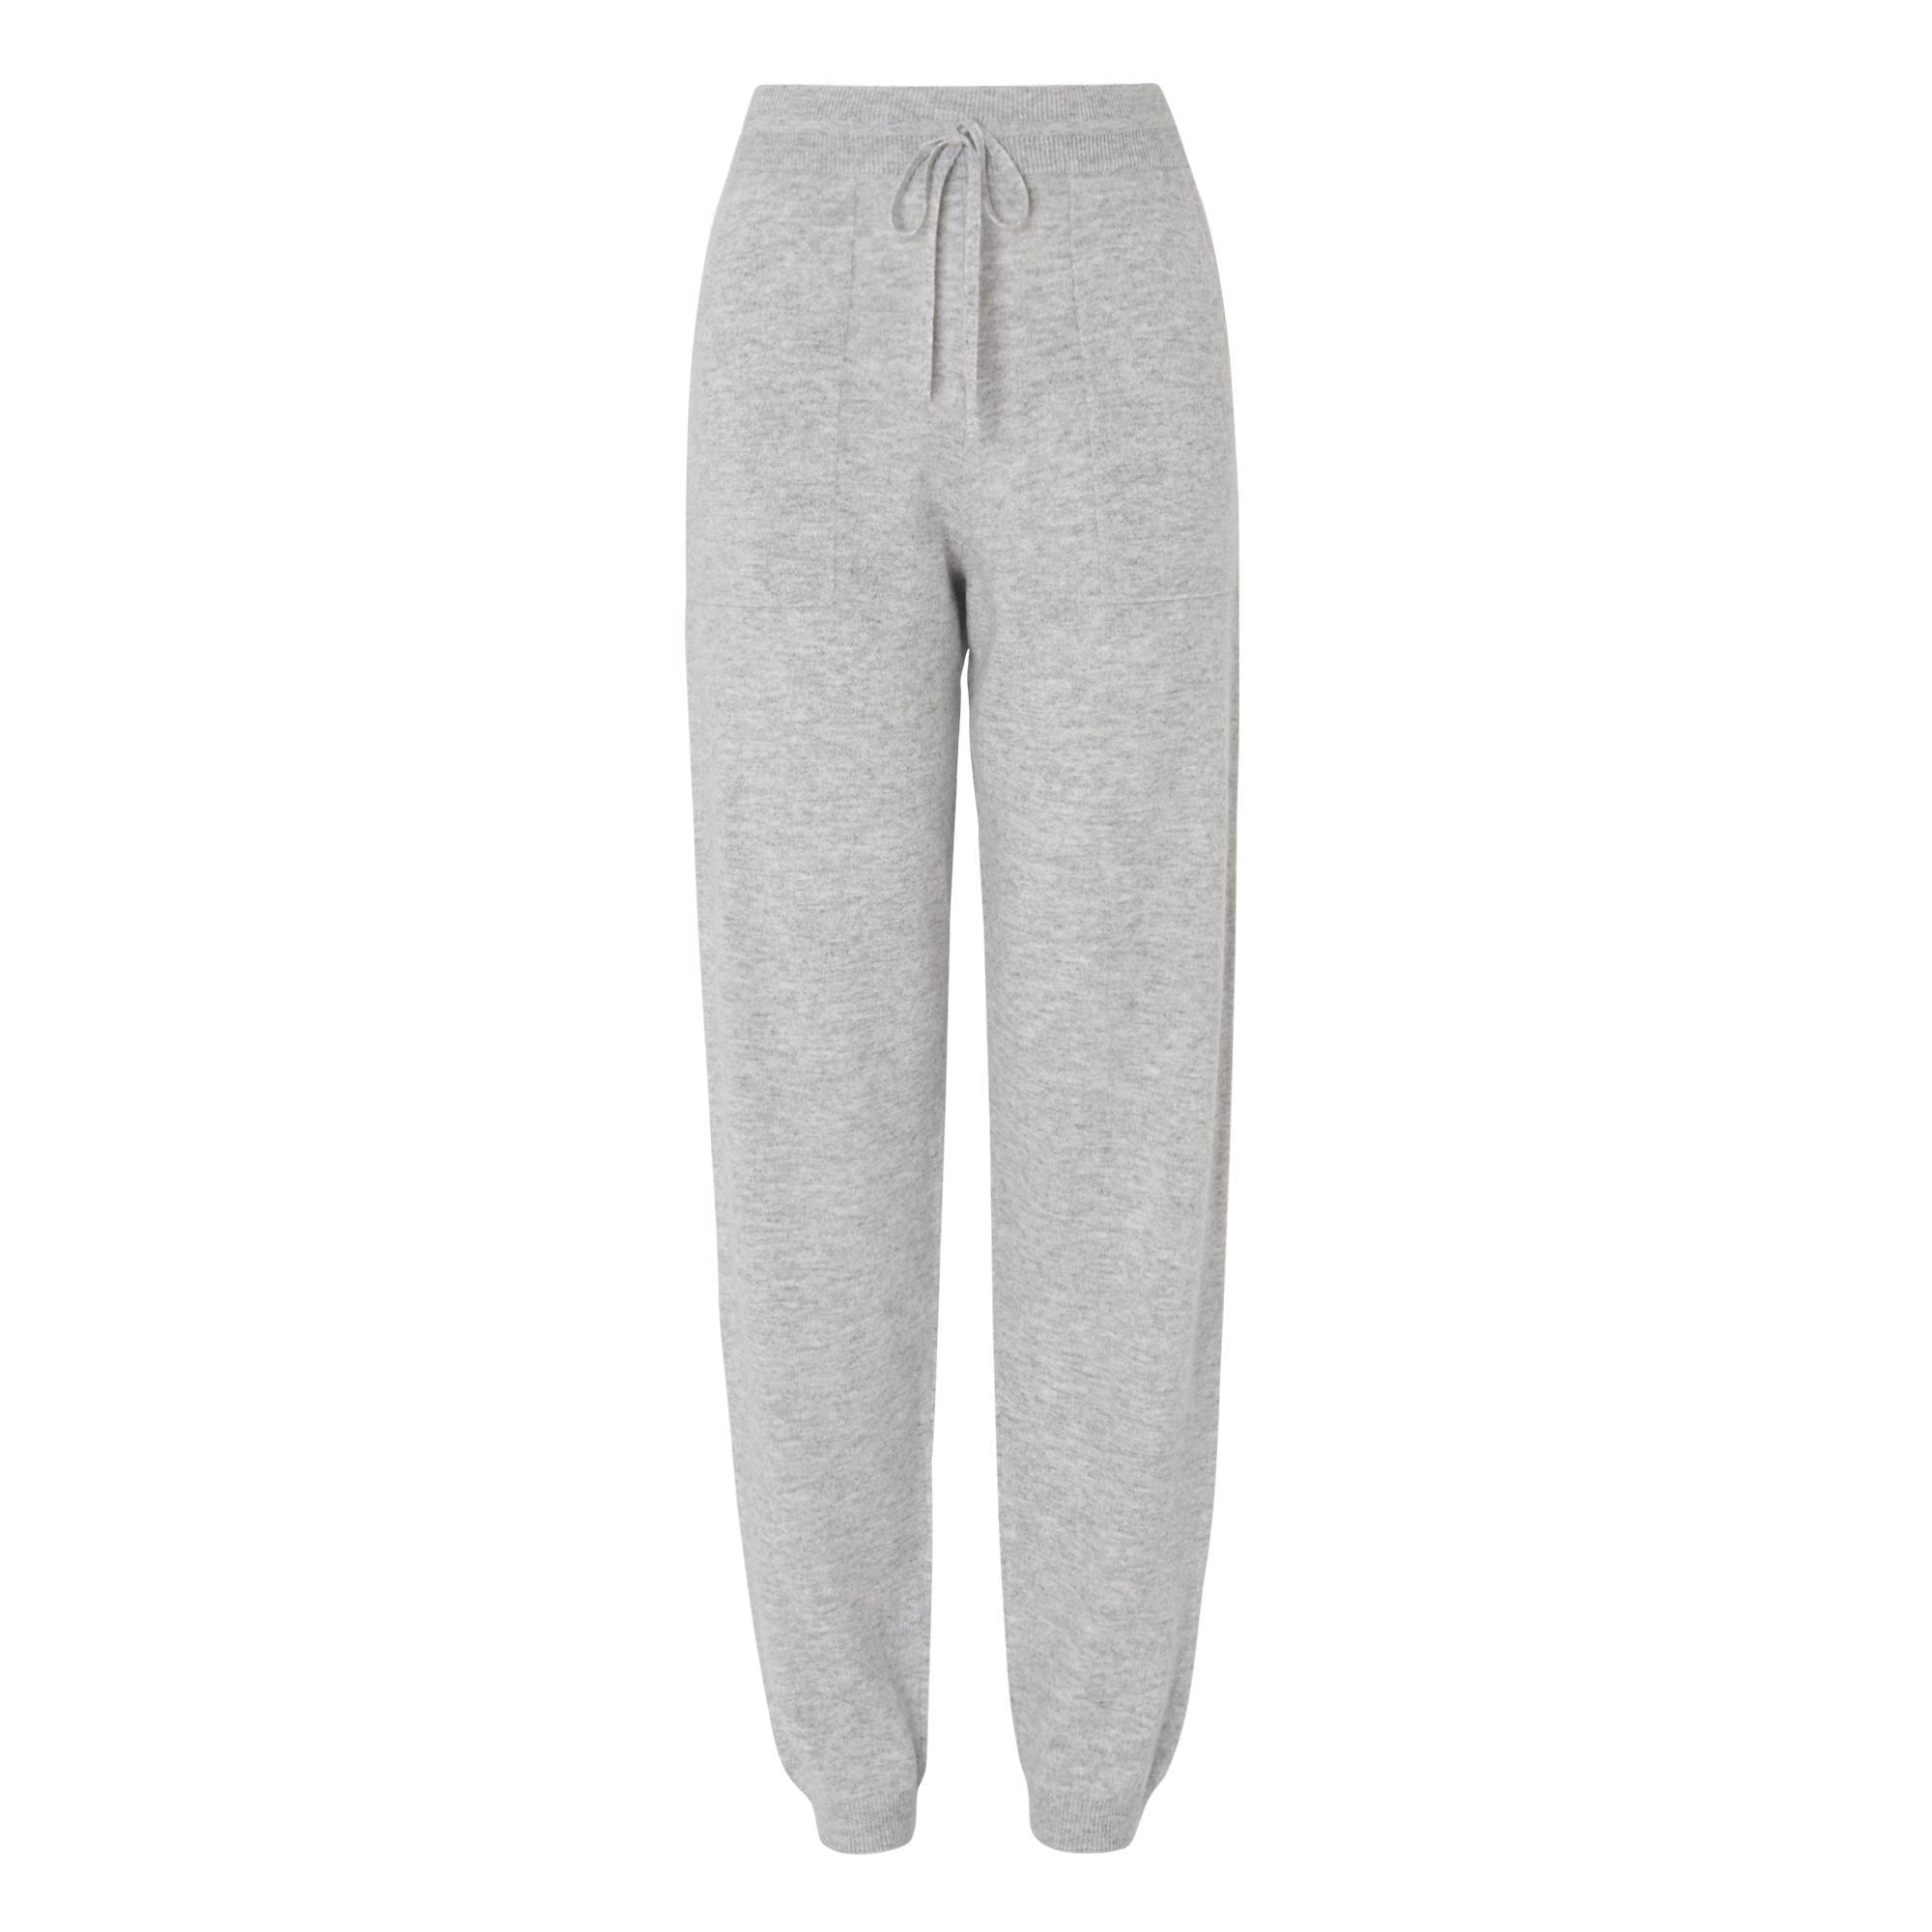 Mika Grey Pants